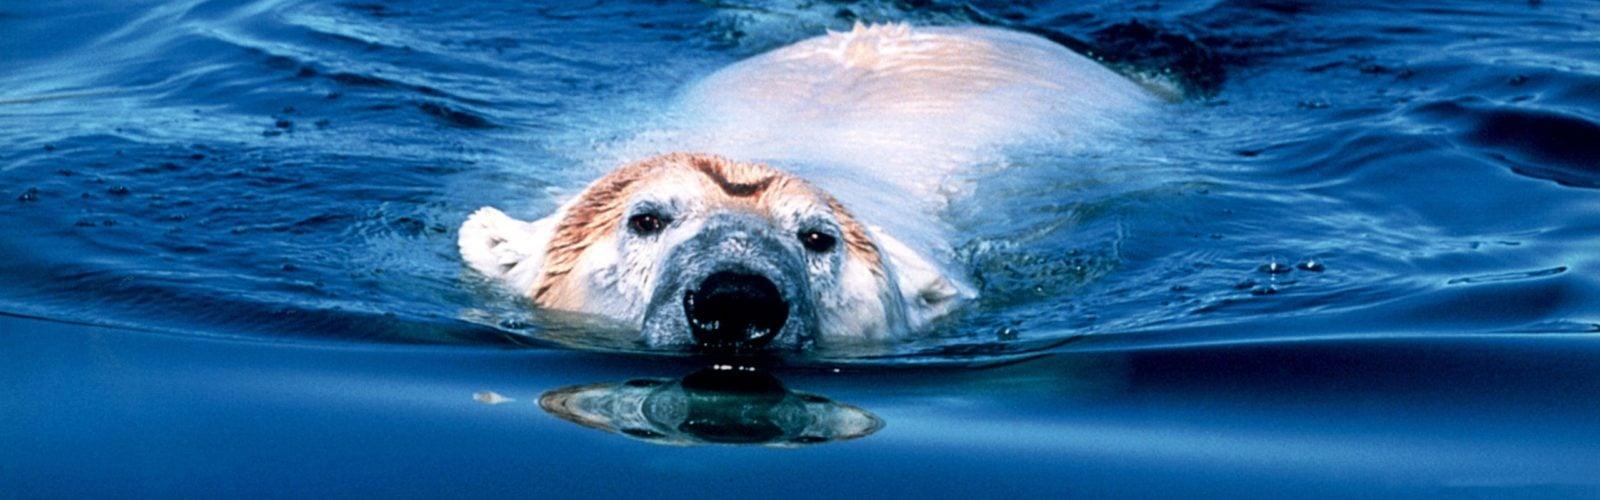 polar-bear-swimming